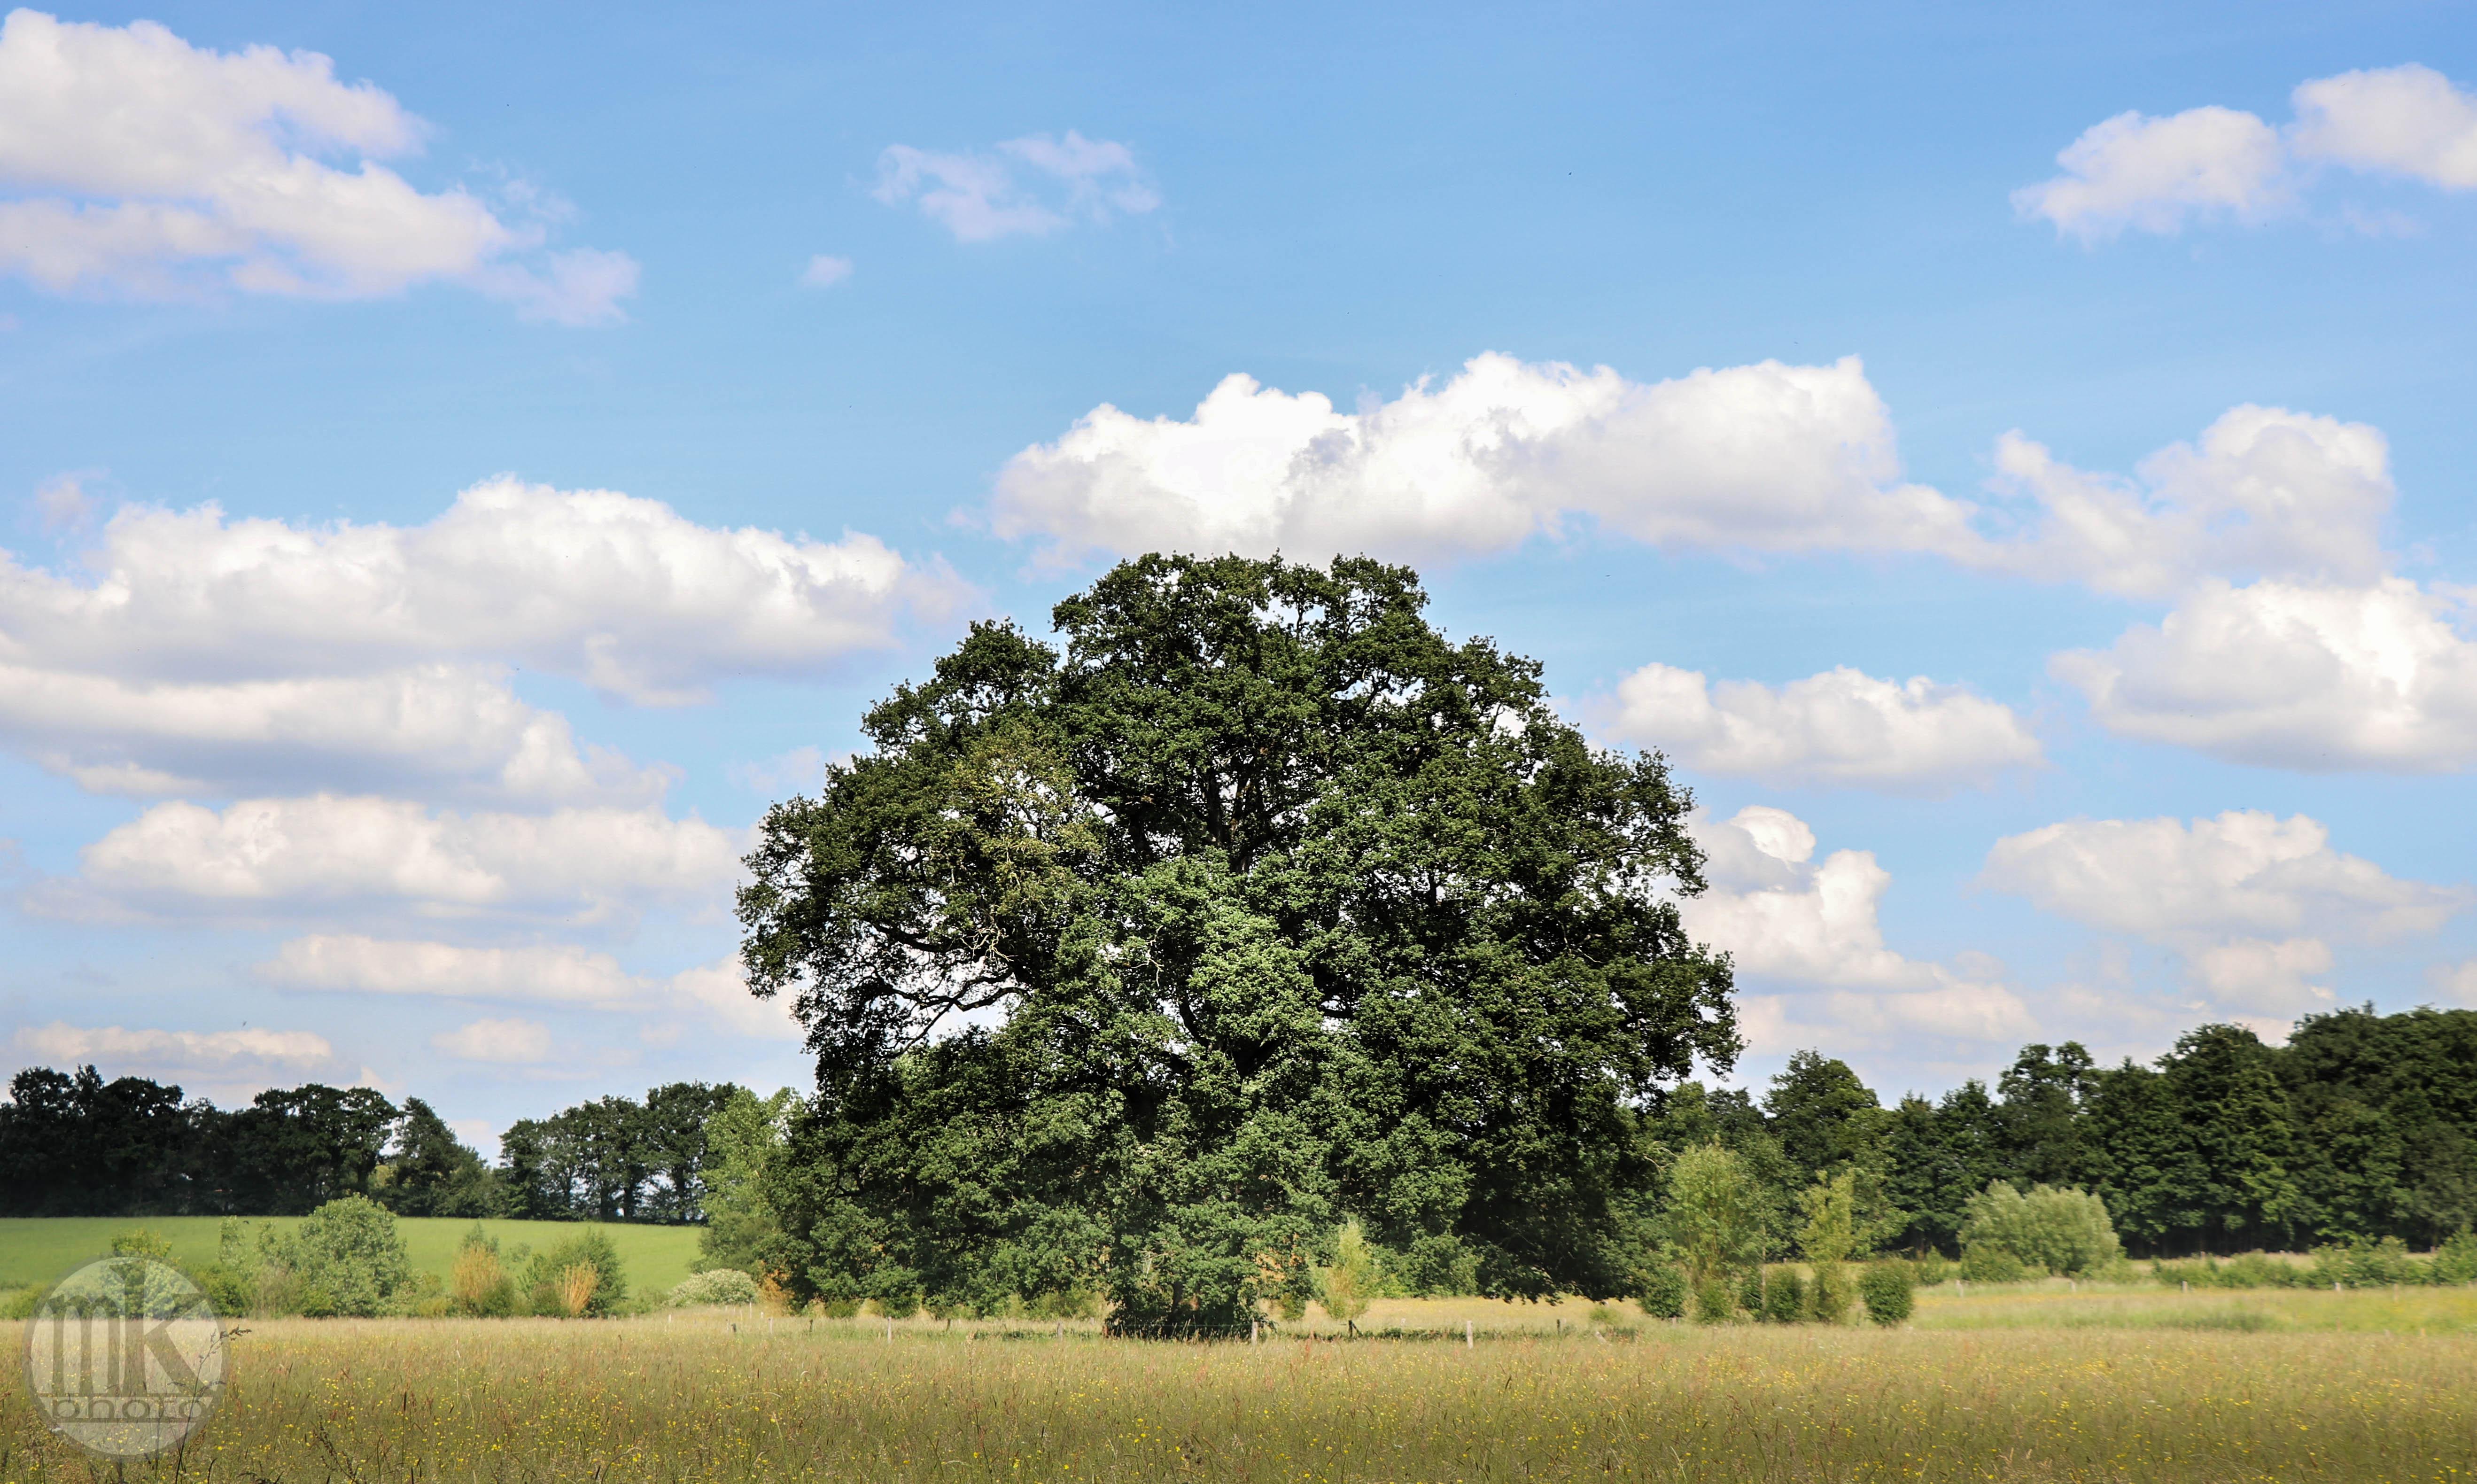 arbre, , Piré s-Seiche, 21 mai 2020, 16-27-08